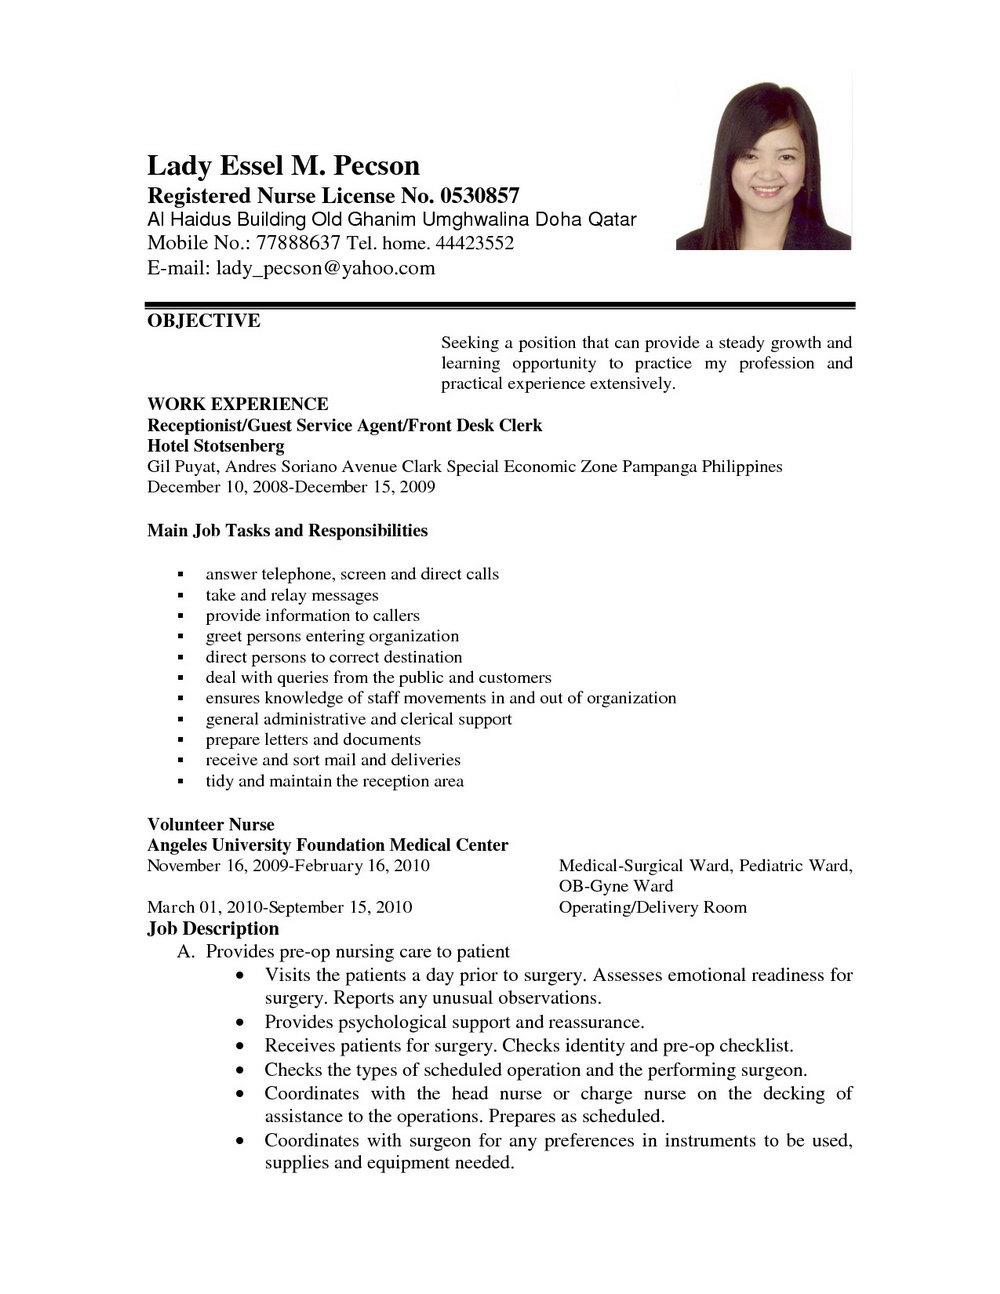 Nursing Job Application Letter